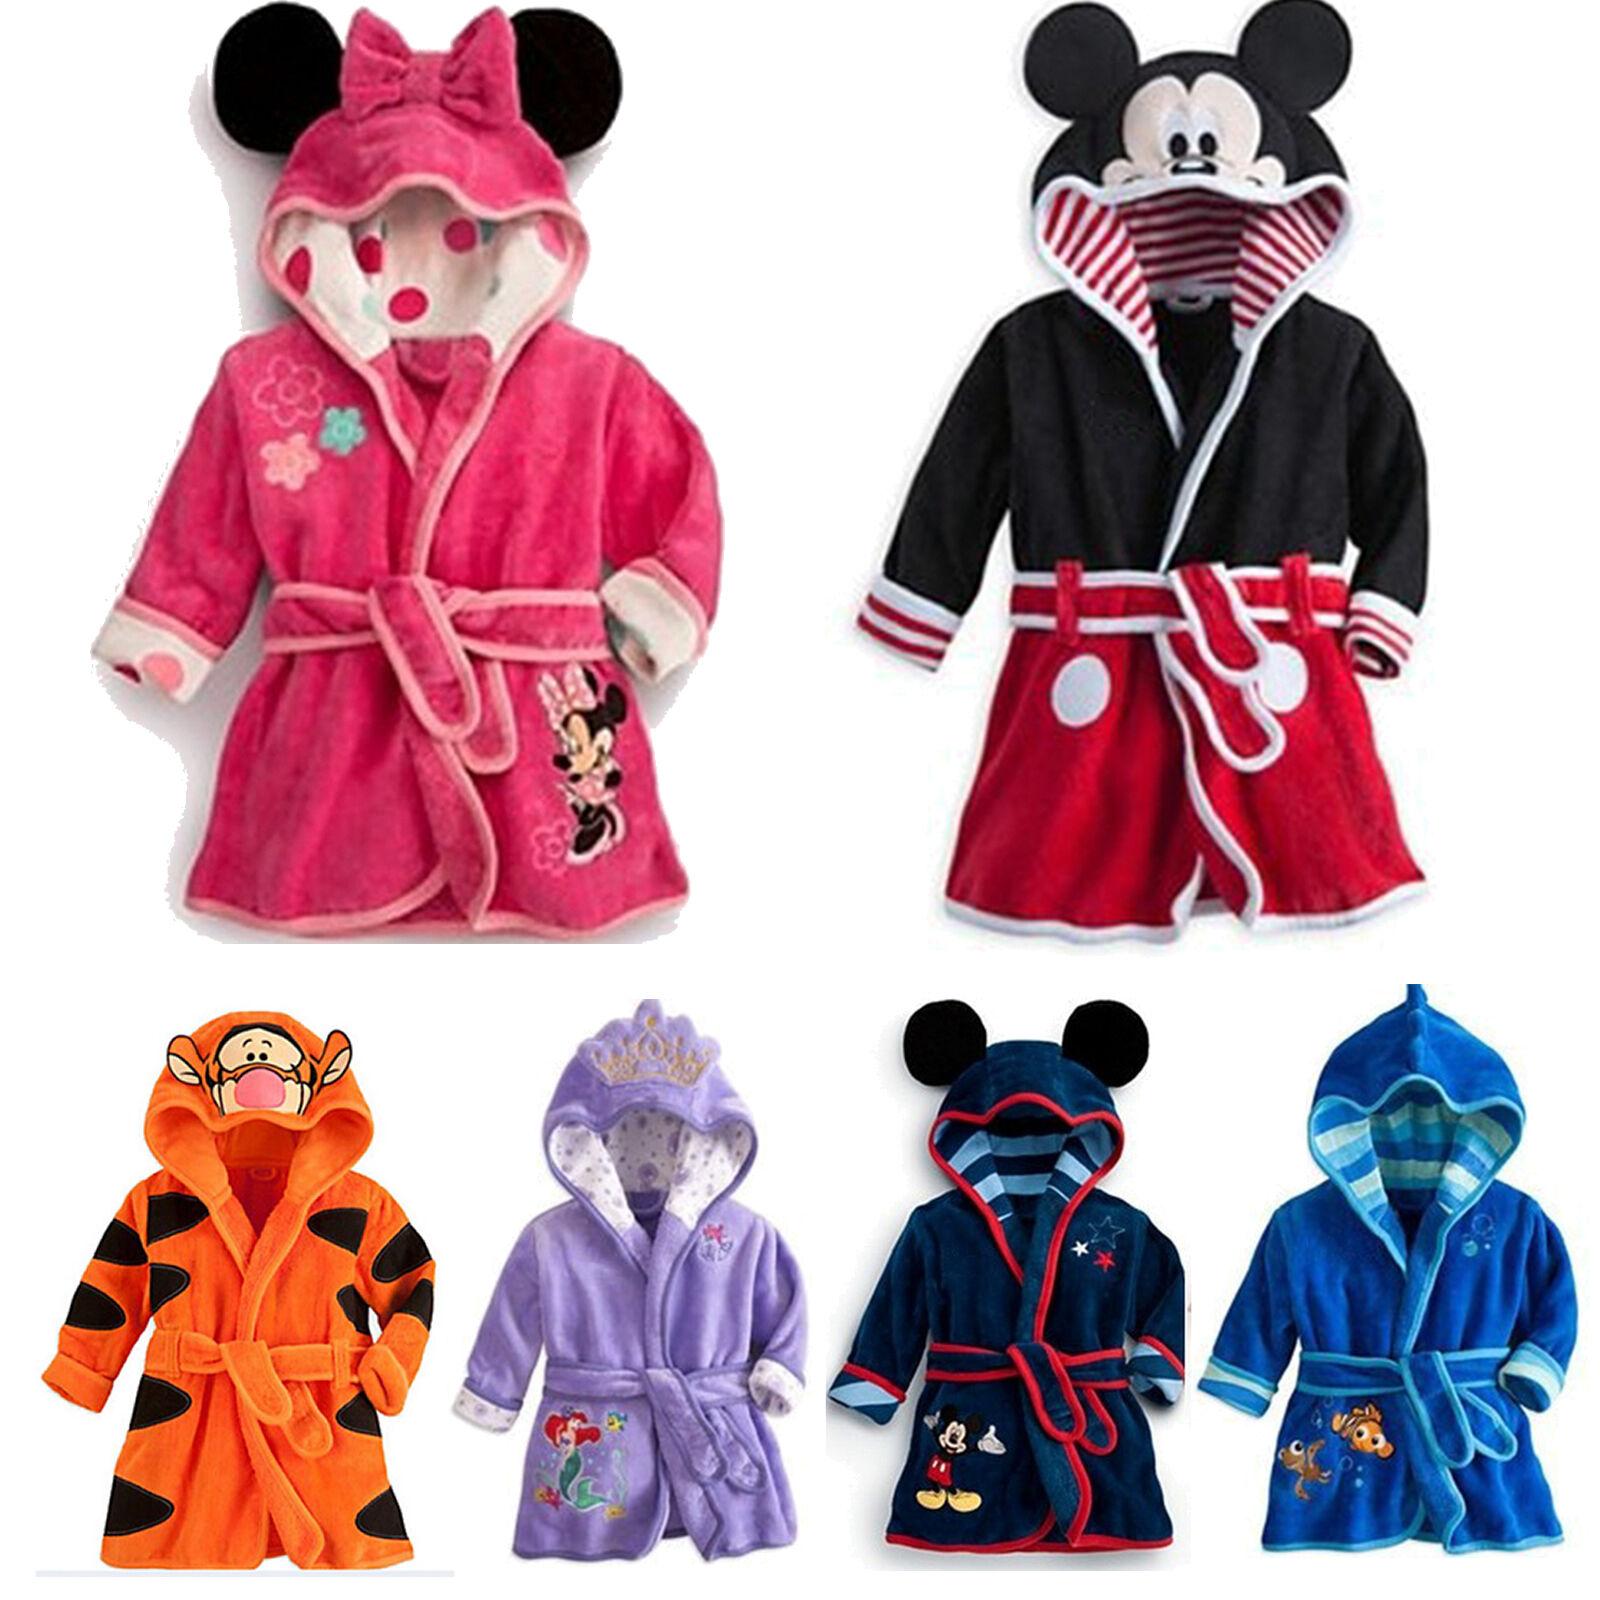 Kinder Bademantel Baby Mickey Kapuze Fleece Nachtwäsche Pyjama Warm PJs Handtuch